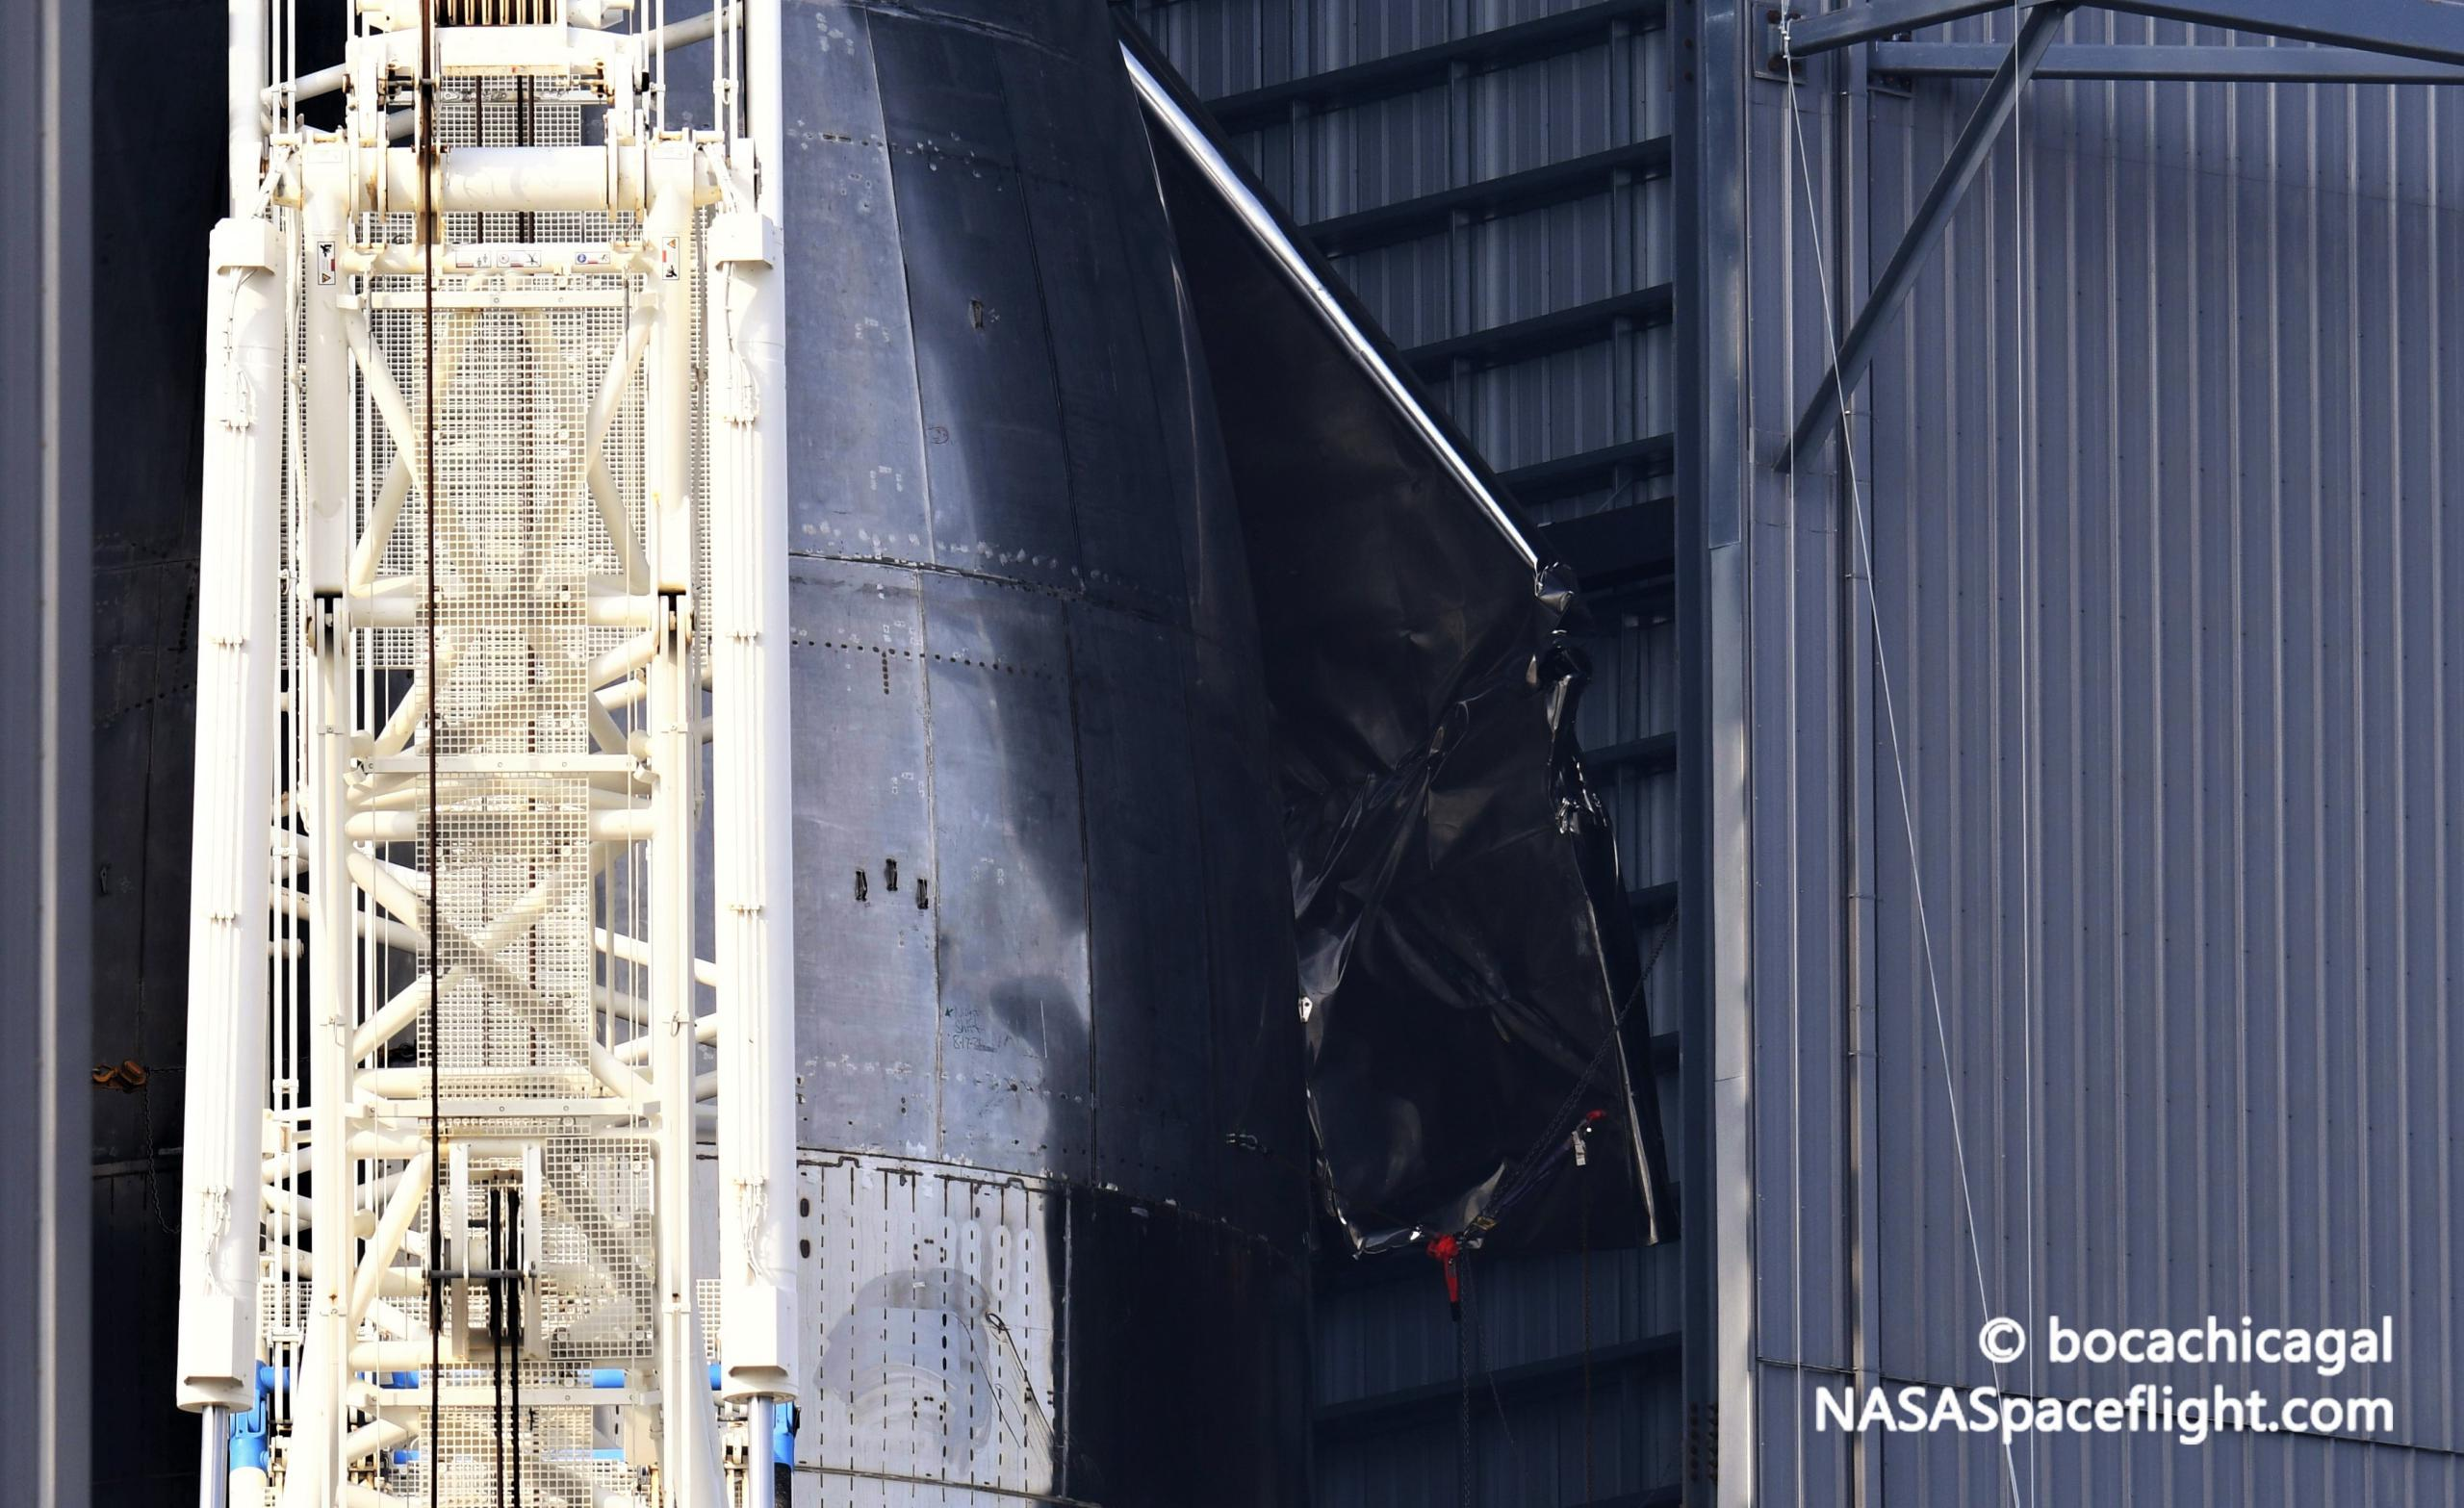 Starship Boca Chica 121320 (NASASpaceflight – bocachicagal) SN9 tip damage 1 (c)